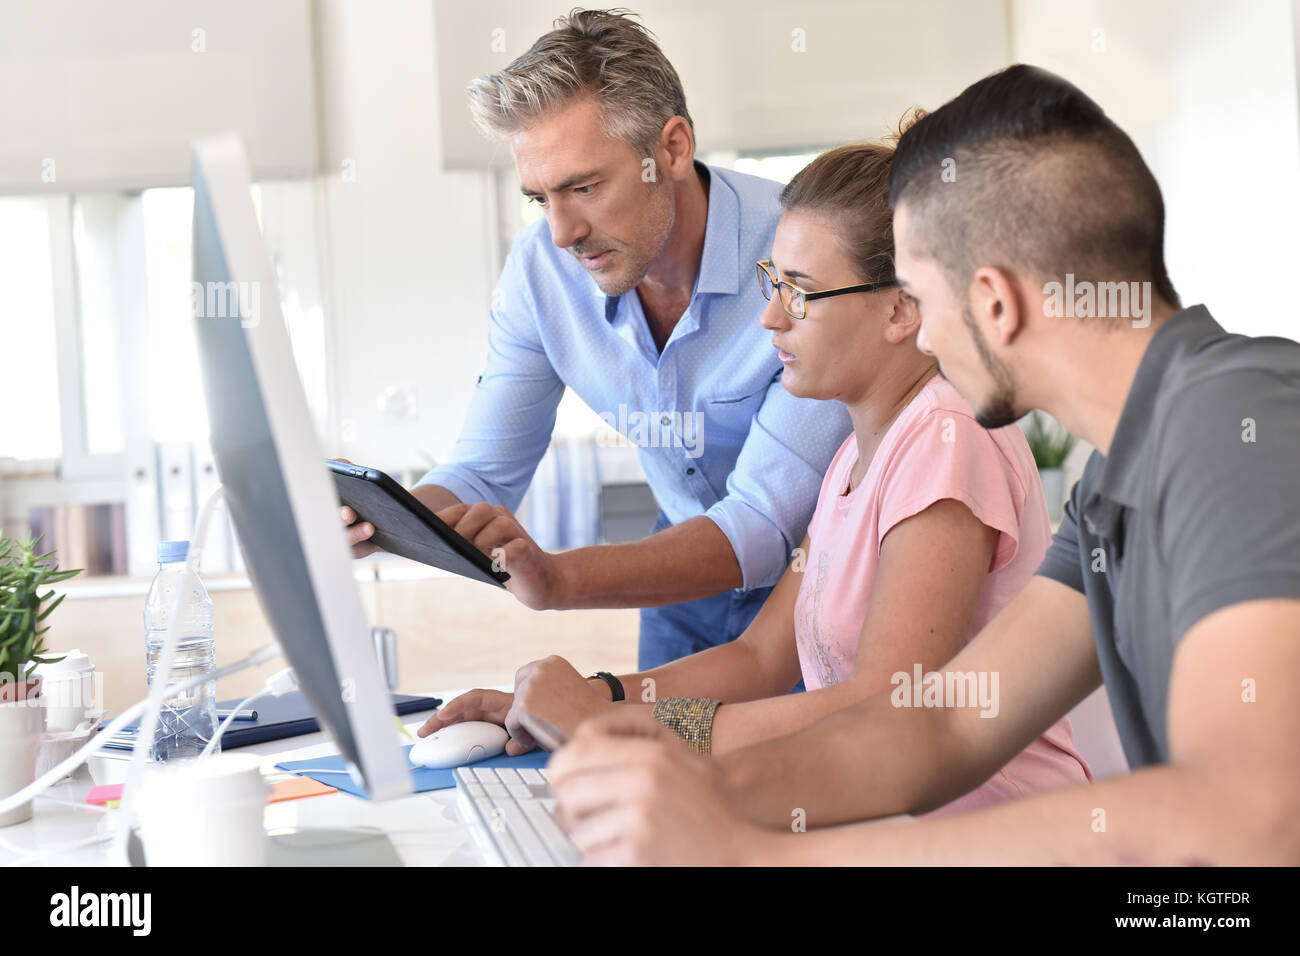 Studenten in Design Schulung mit Tablet Stockbild